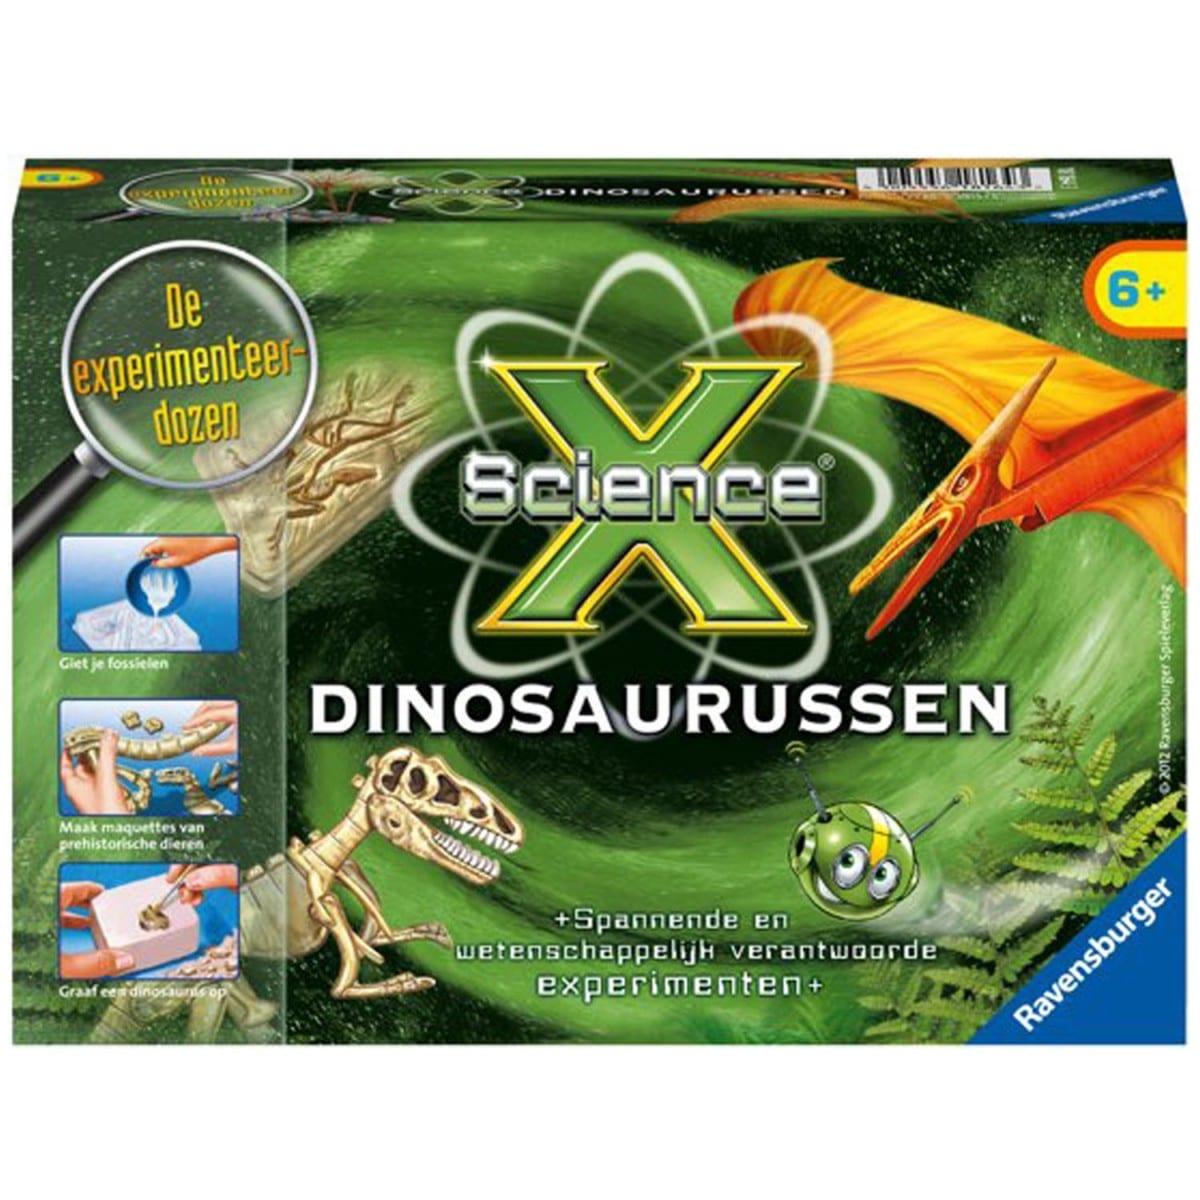 Ravensburger ScienceX® Dinosaurussen